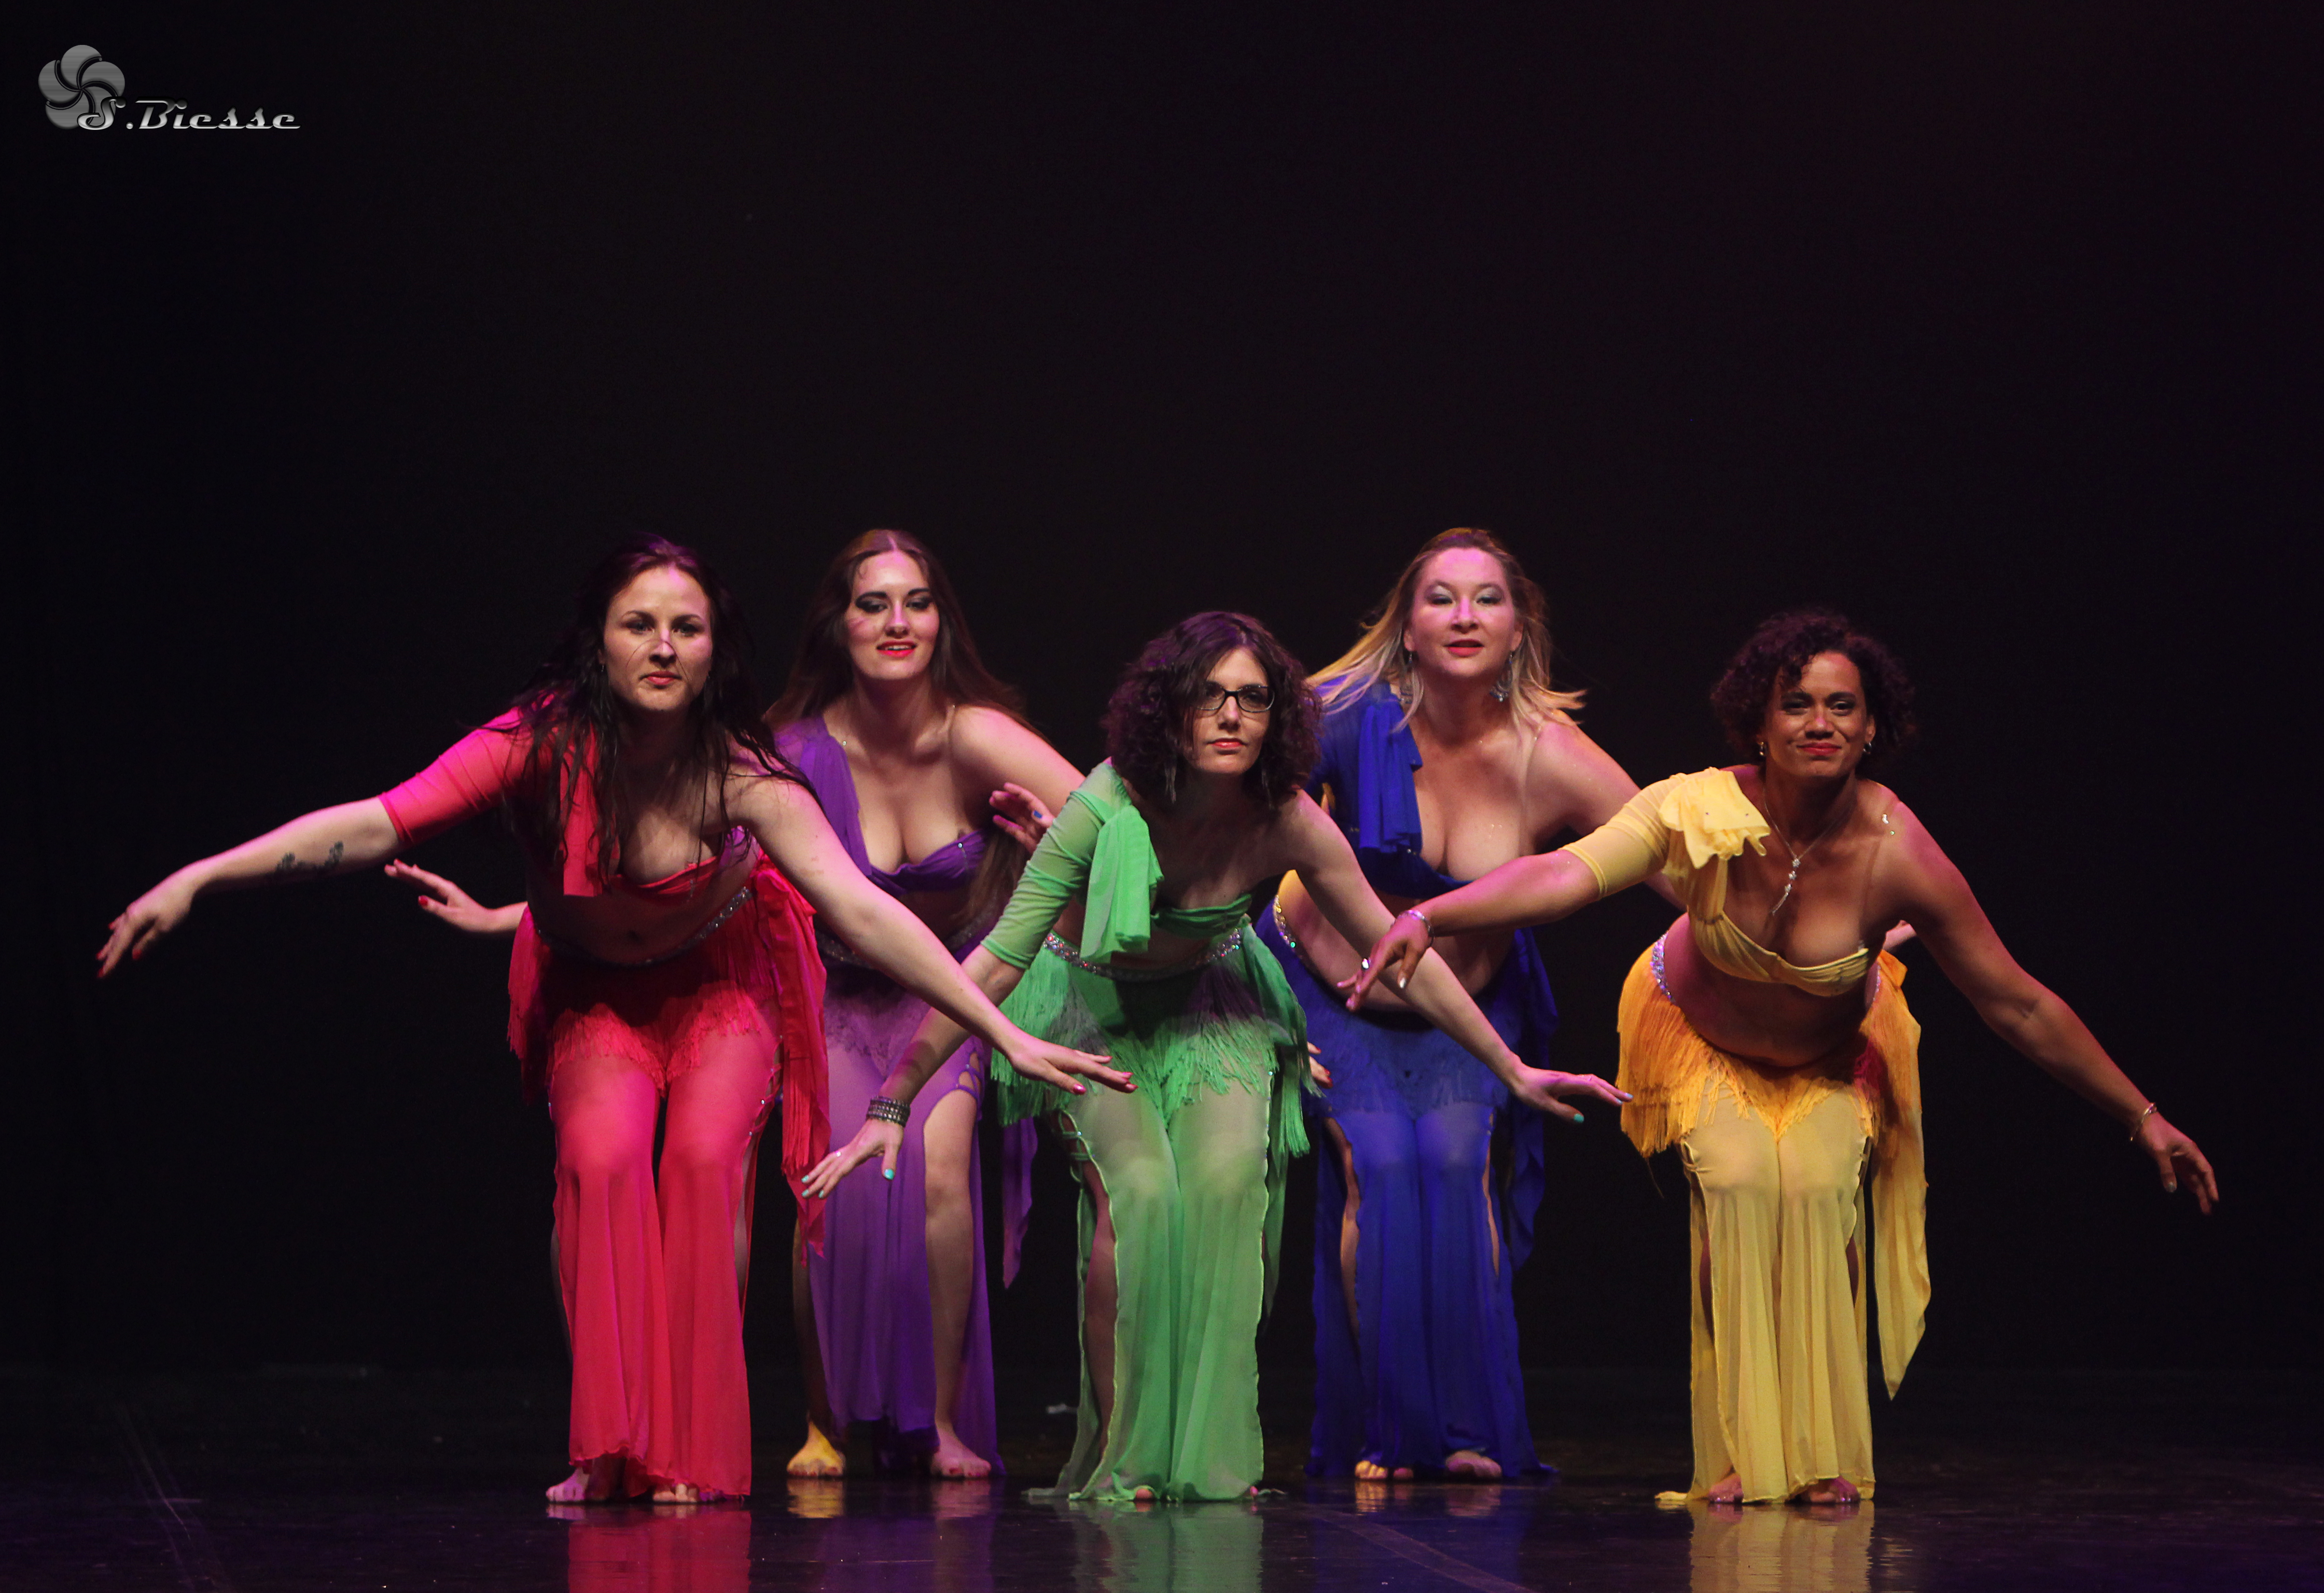 Gala élèves Neïla danse orientale bordeaux